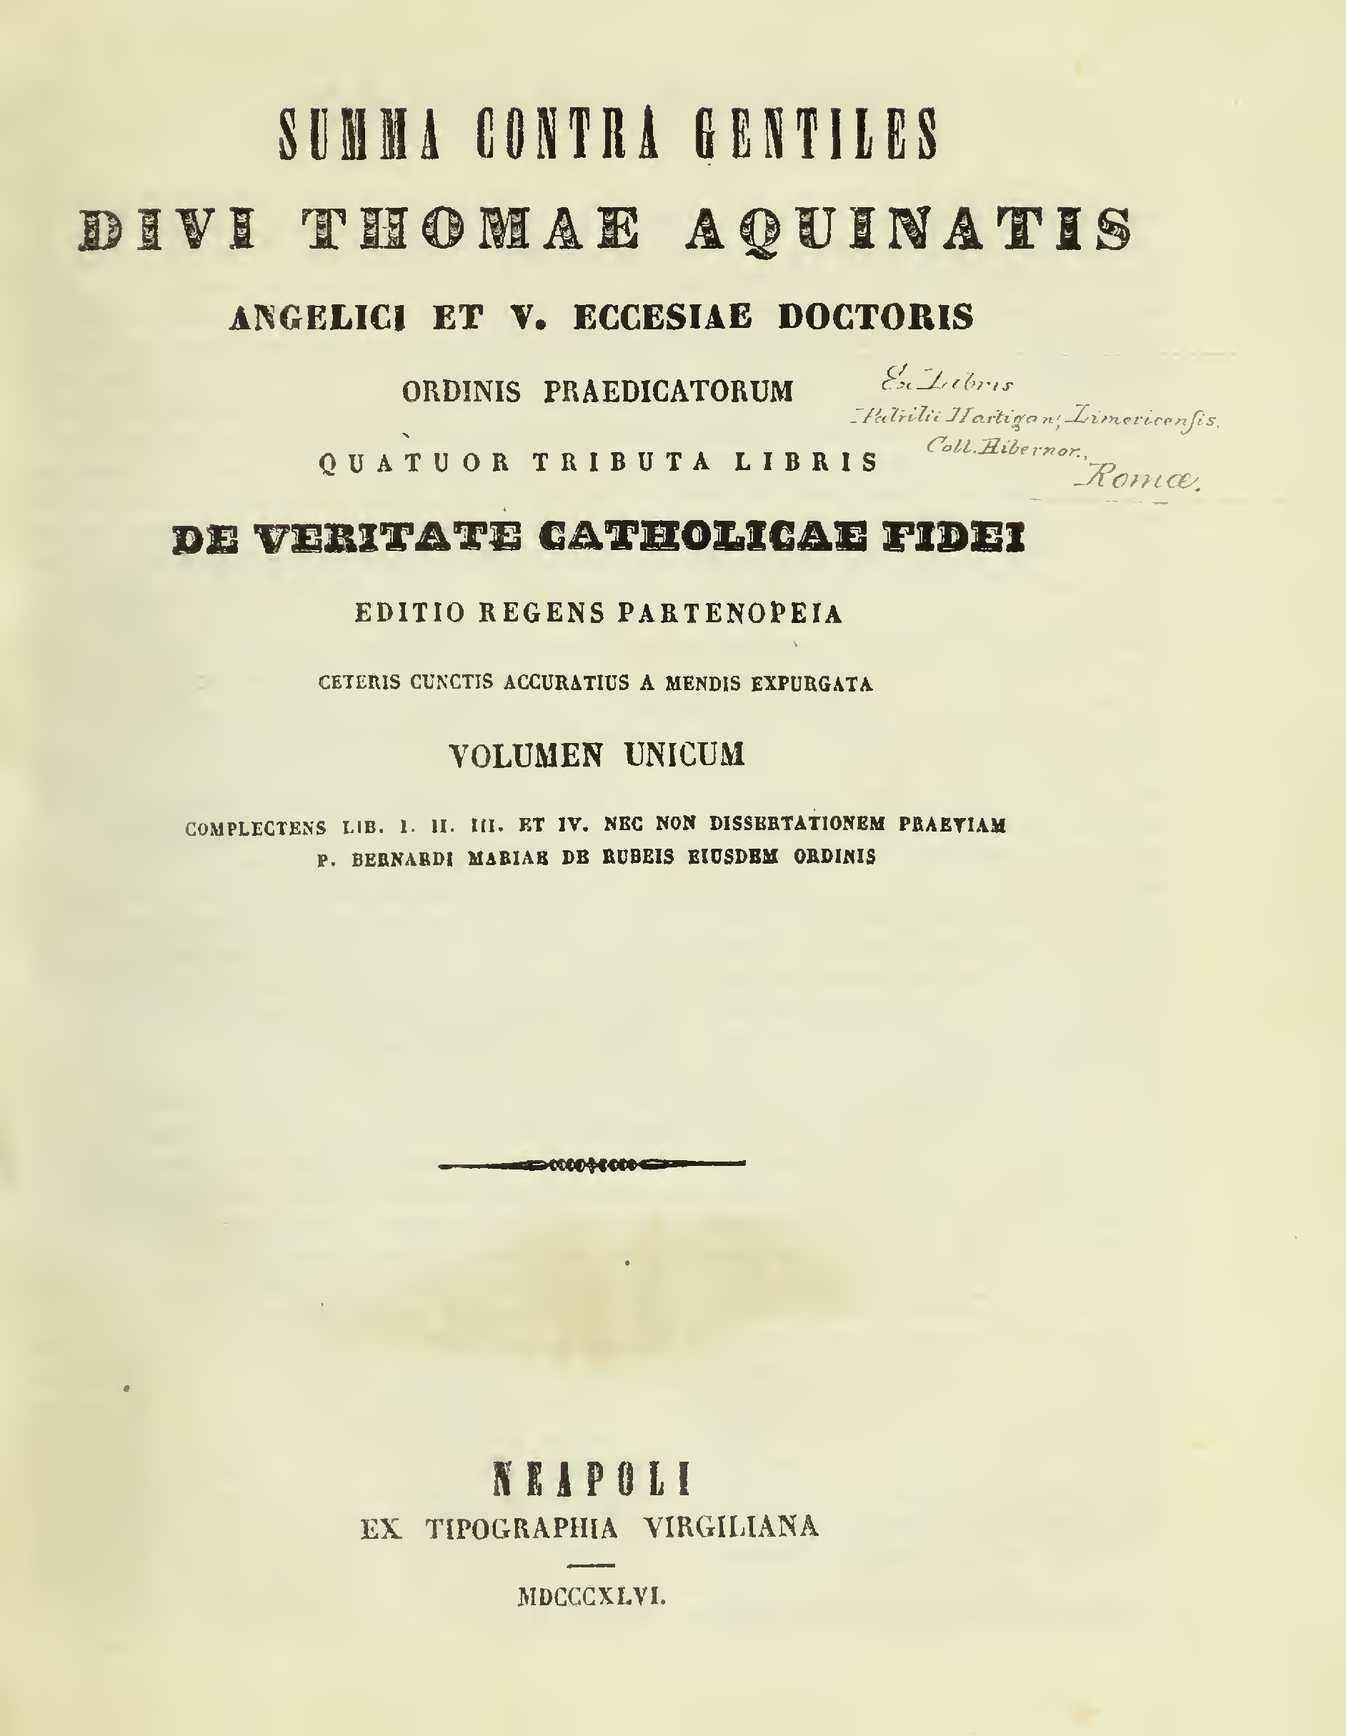 Calaméo Summa proti pohanům 1 – Summa contra gentiles divi Thomae Aquinatis Thomas de Aquino svat½ 1846